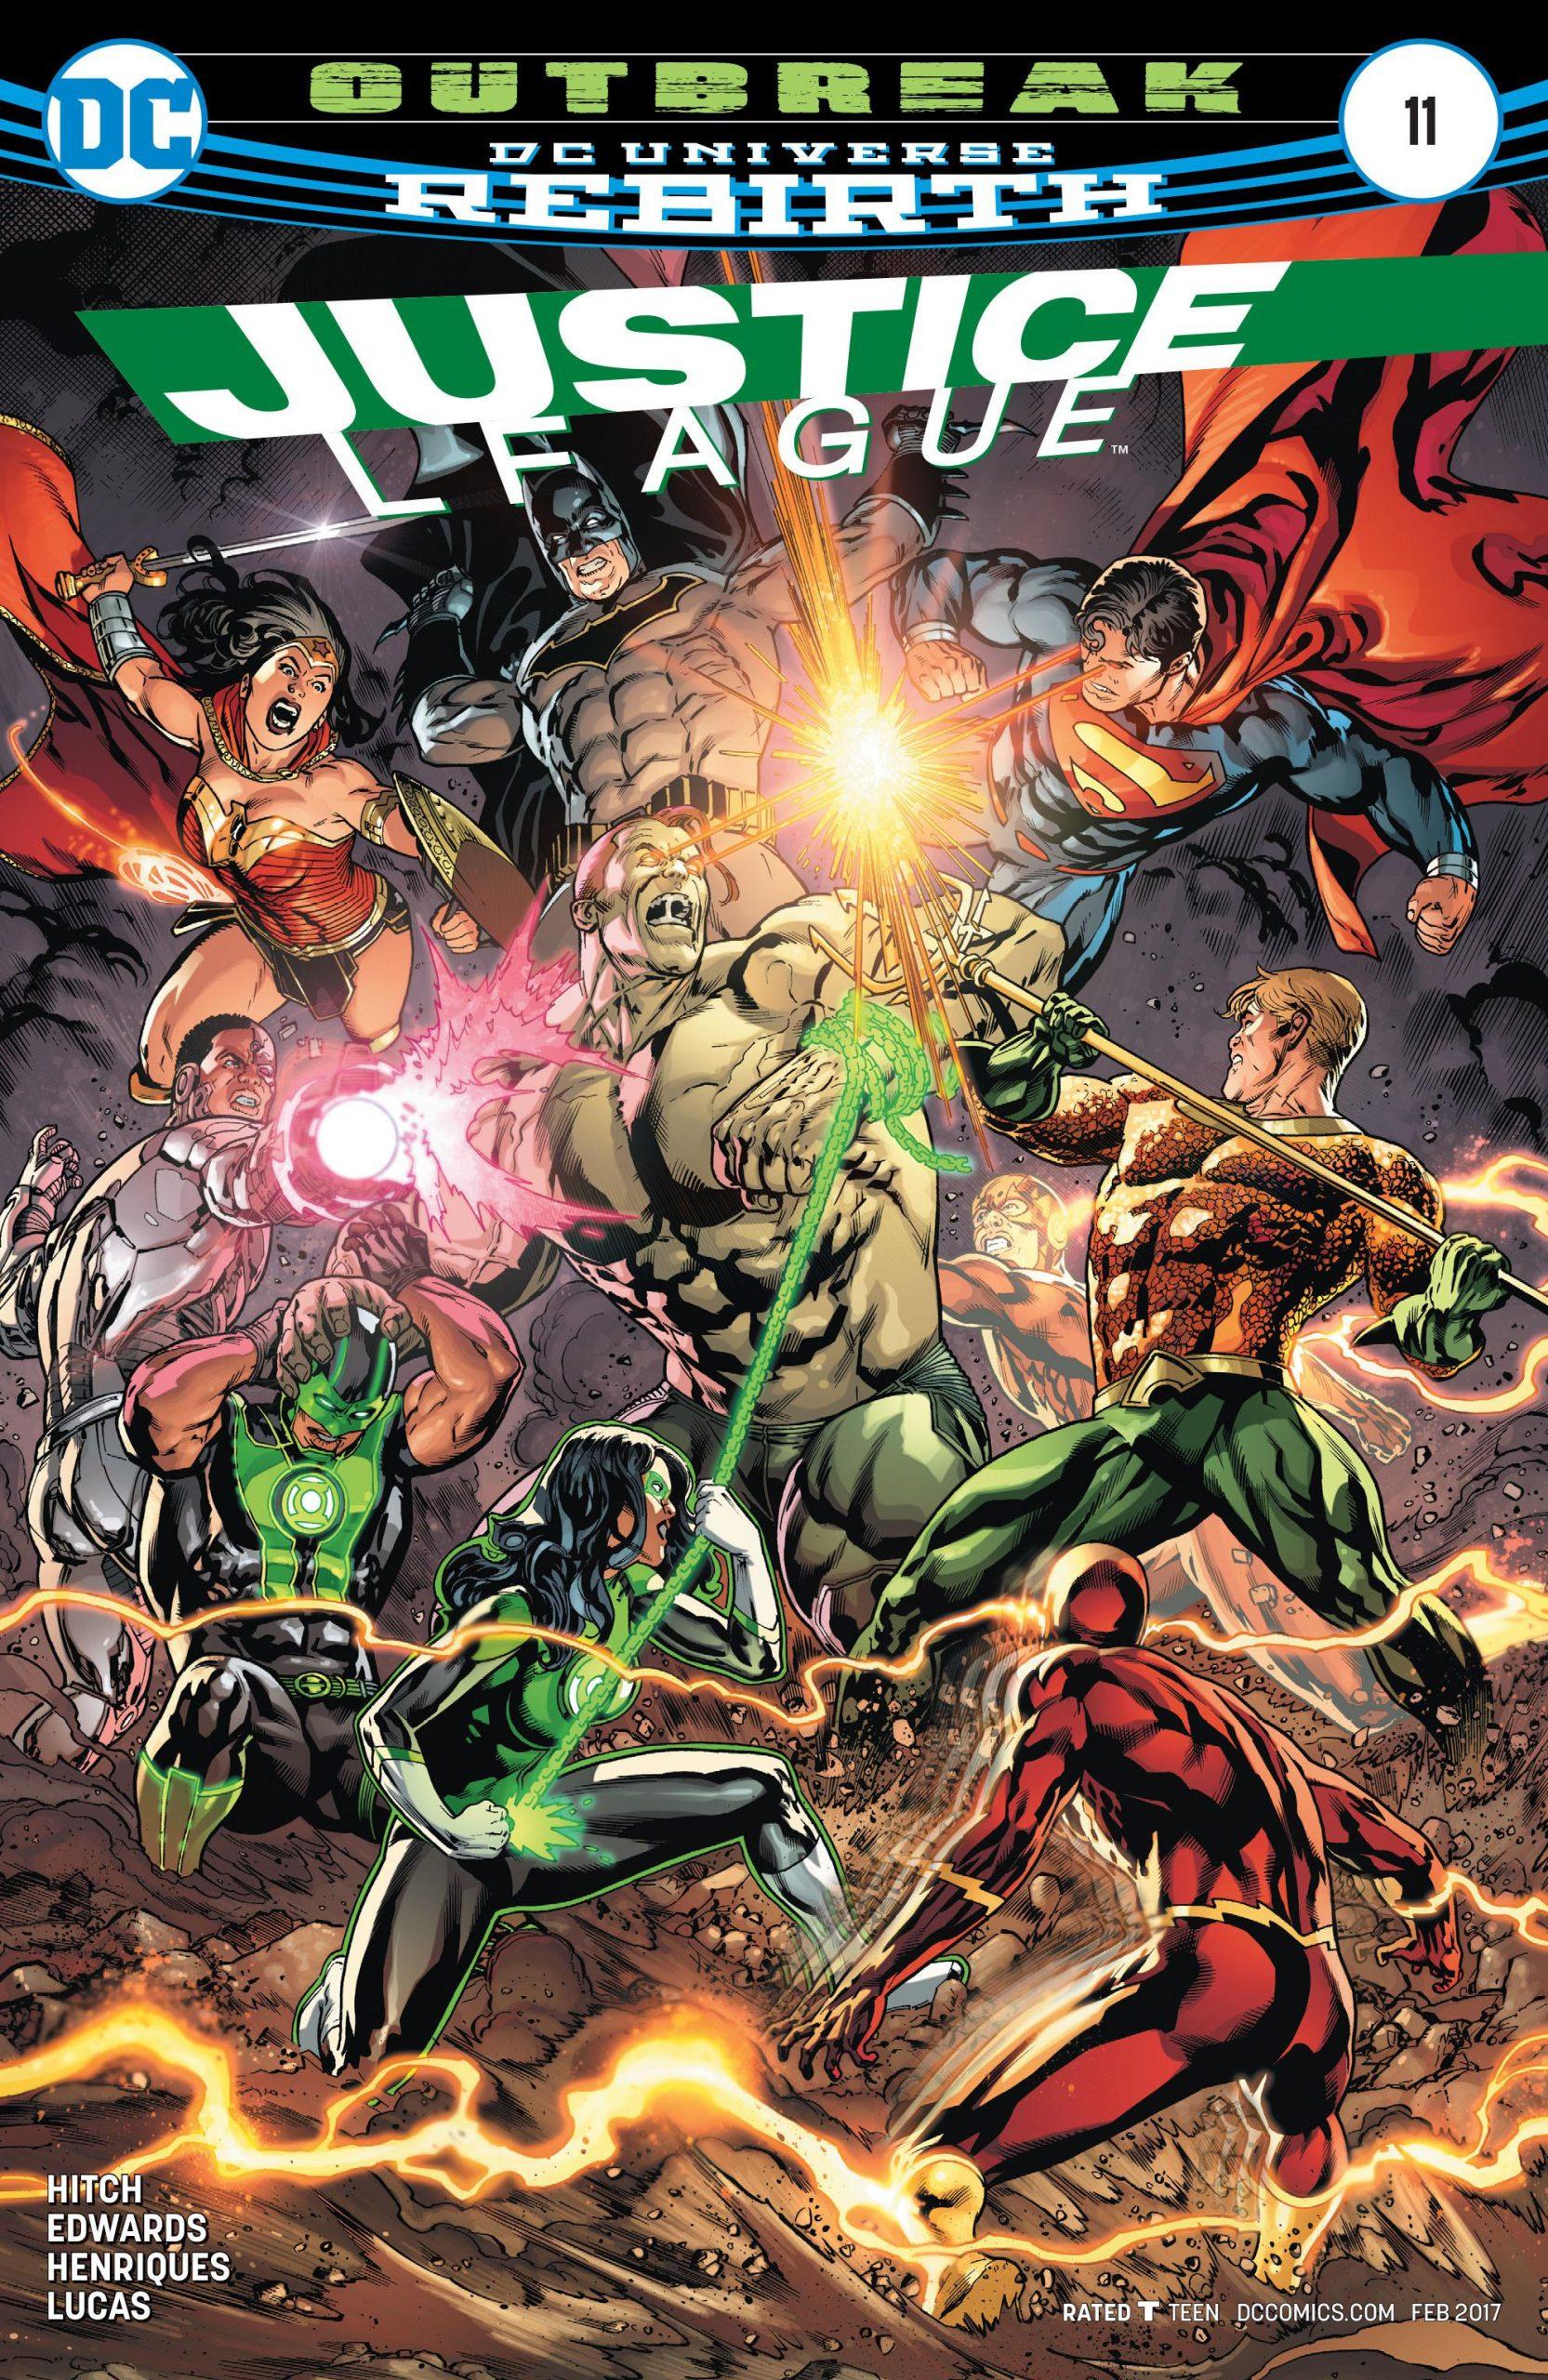 Justice League volume three issue 11